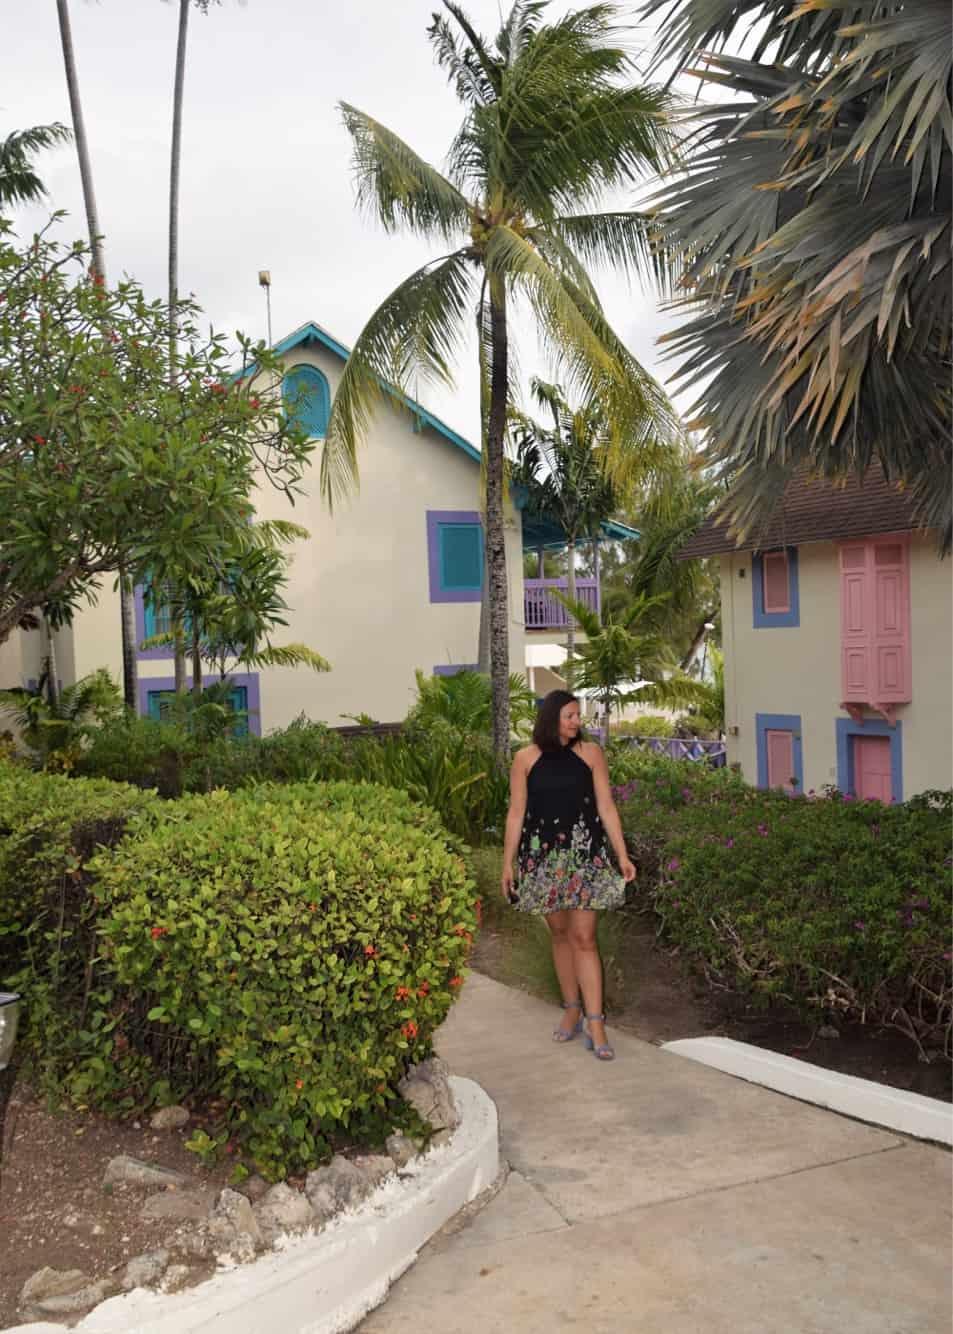 Tropical Dress for an Island Getaway